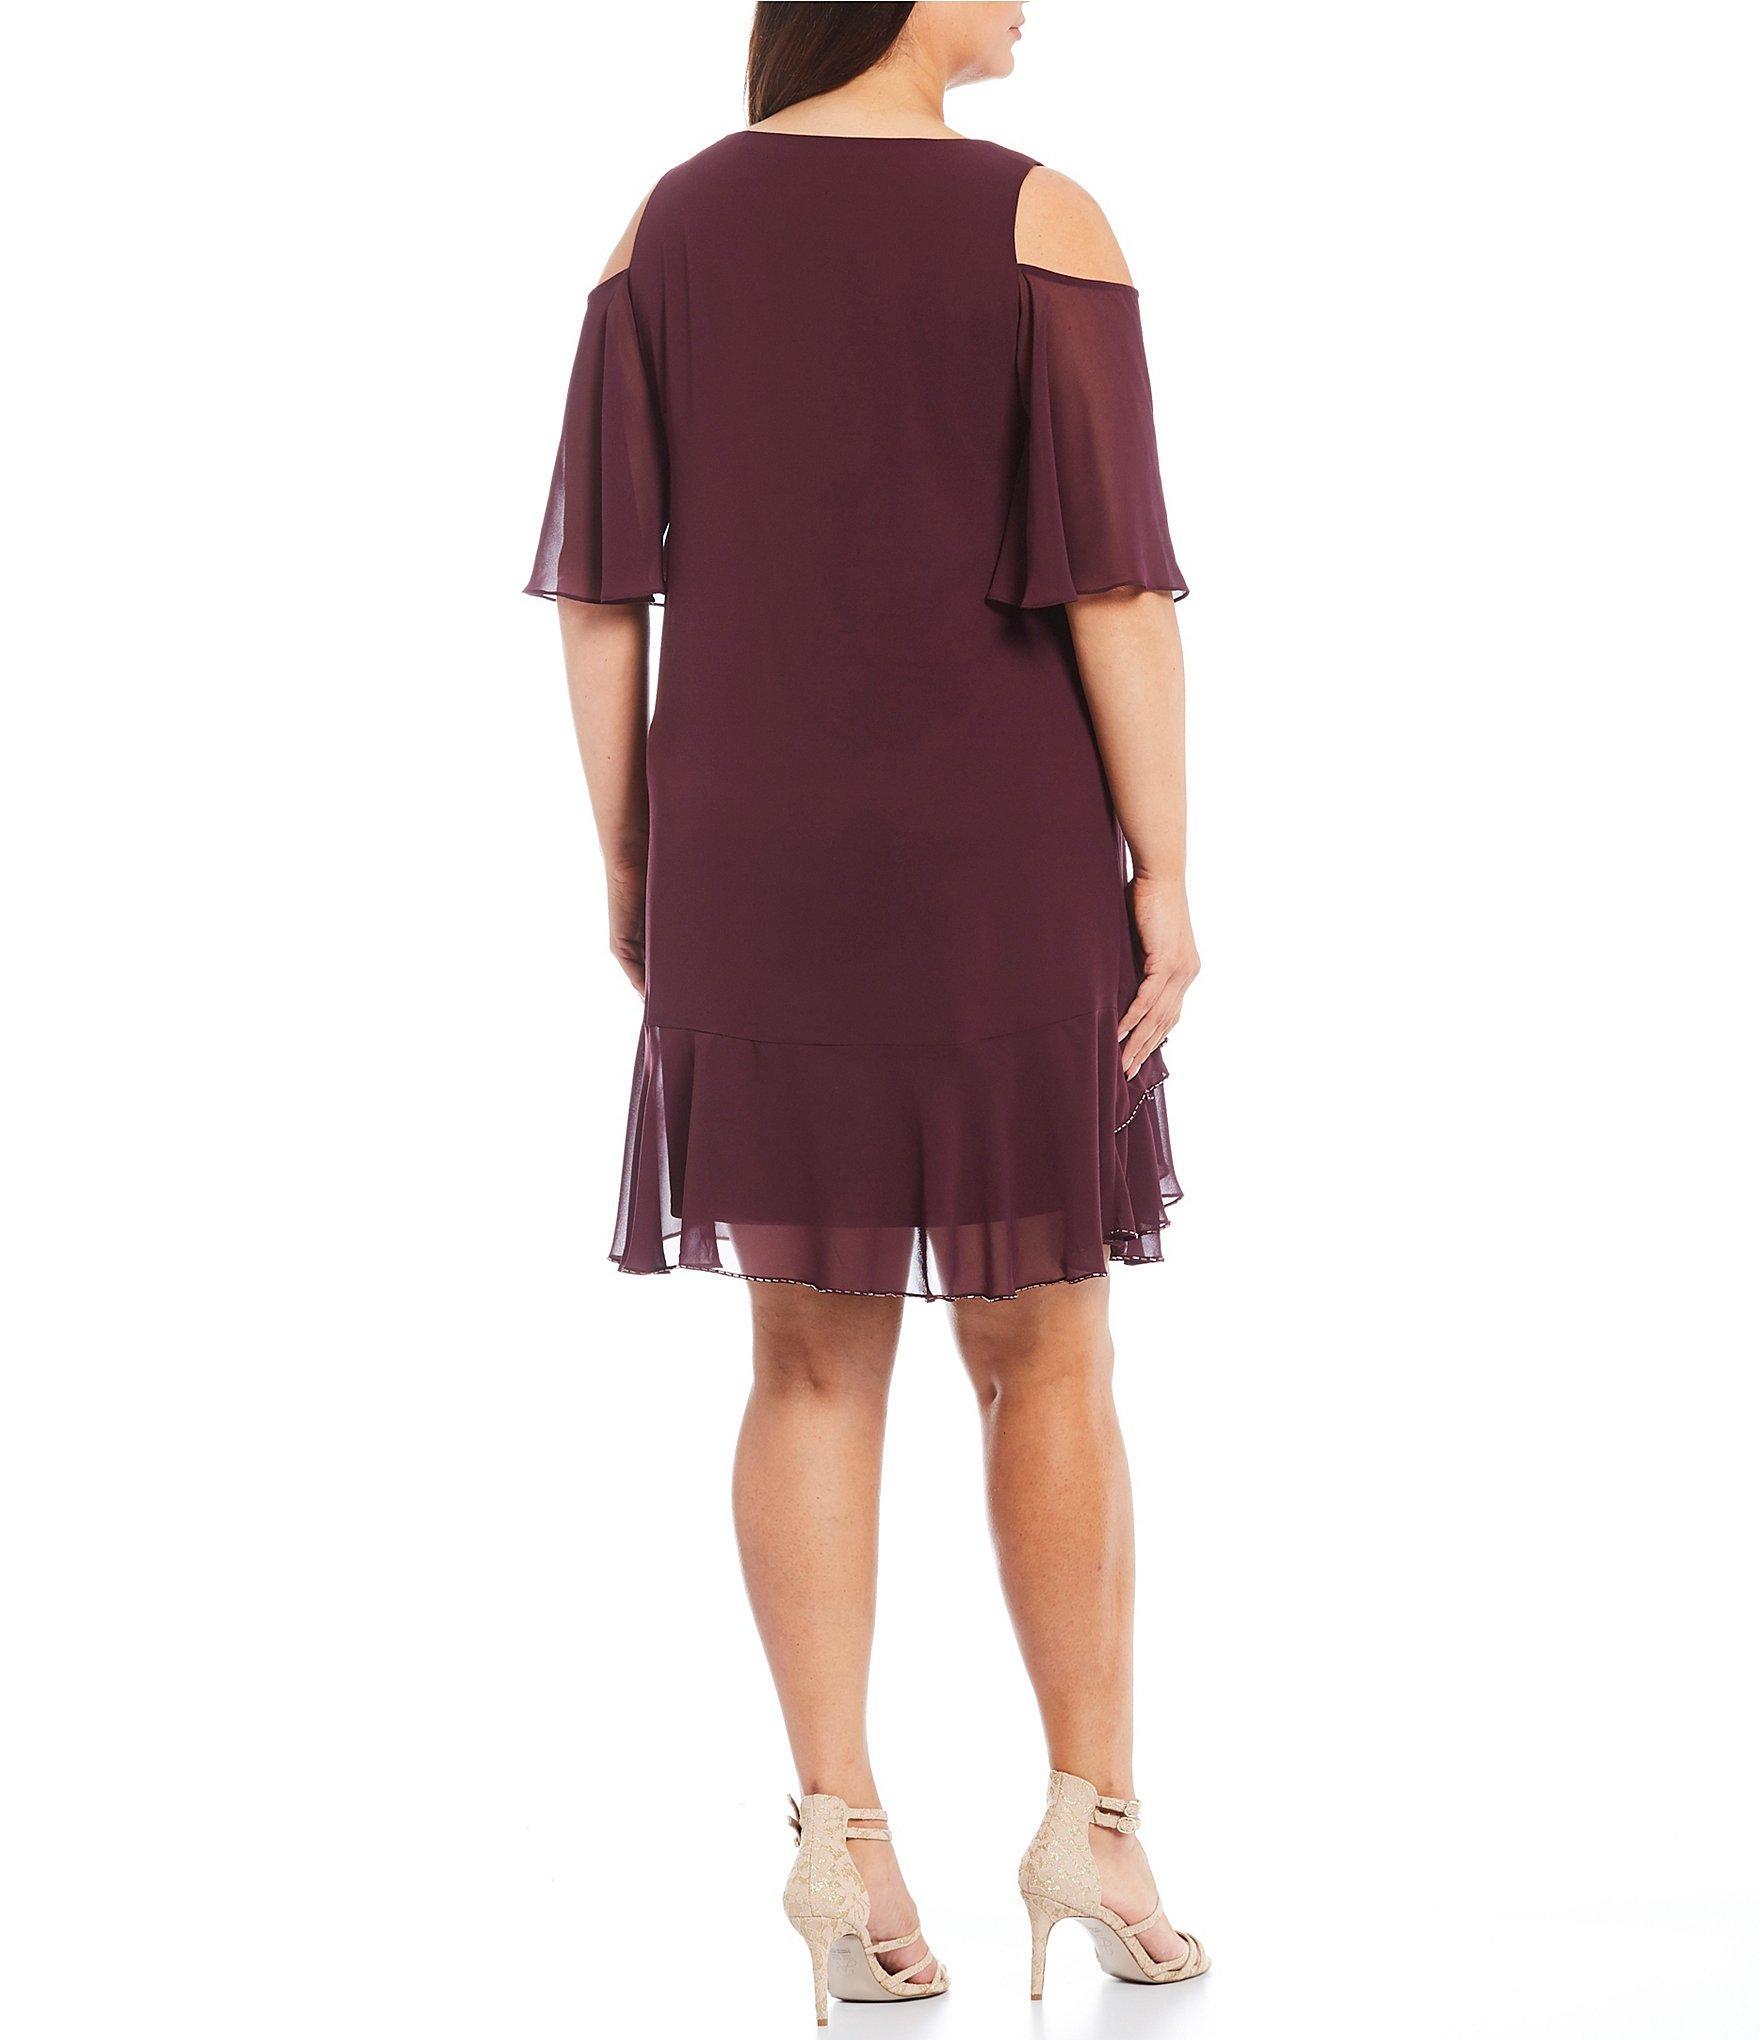 31702b9a21 Marina - Purple Plus Size Chiffon Cold Shoulder Tiered Dress - Lyst. View  fullscreen